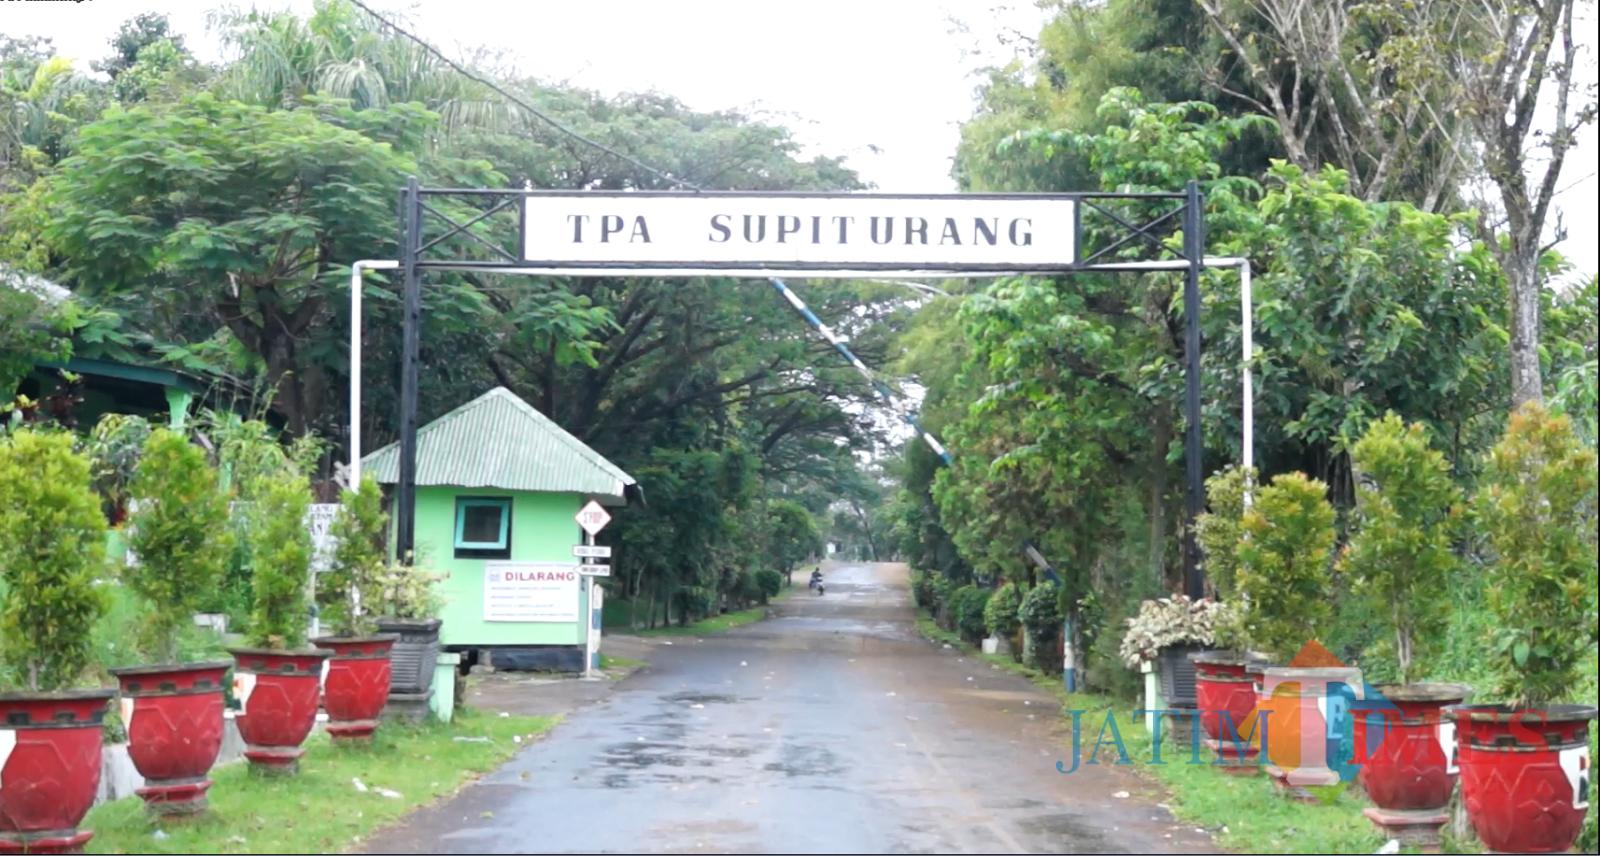 Jalan sekaligus pintu masuk TPA Supit Urang. (DLH Kota Malang)